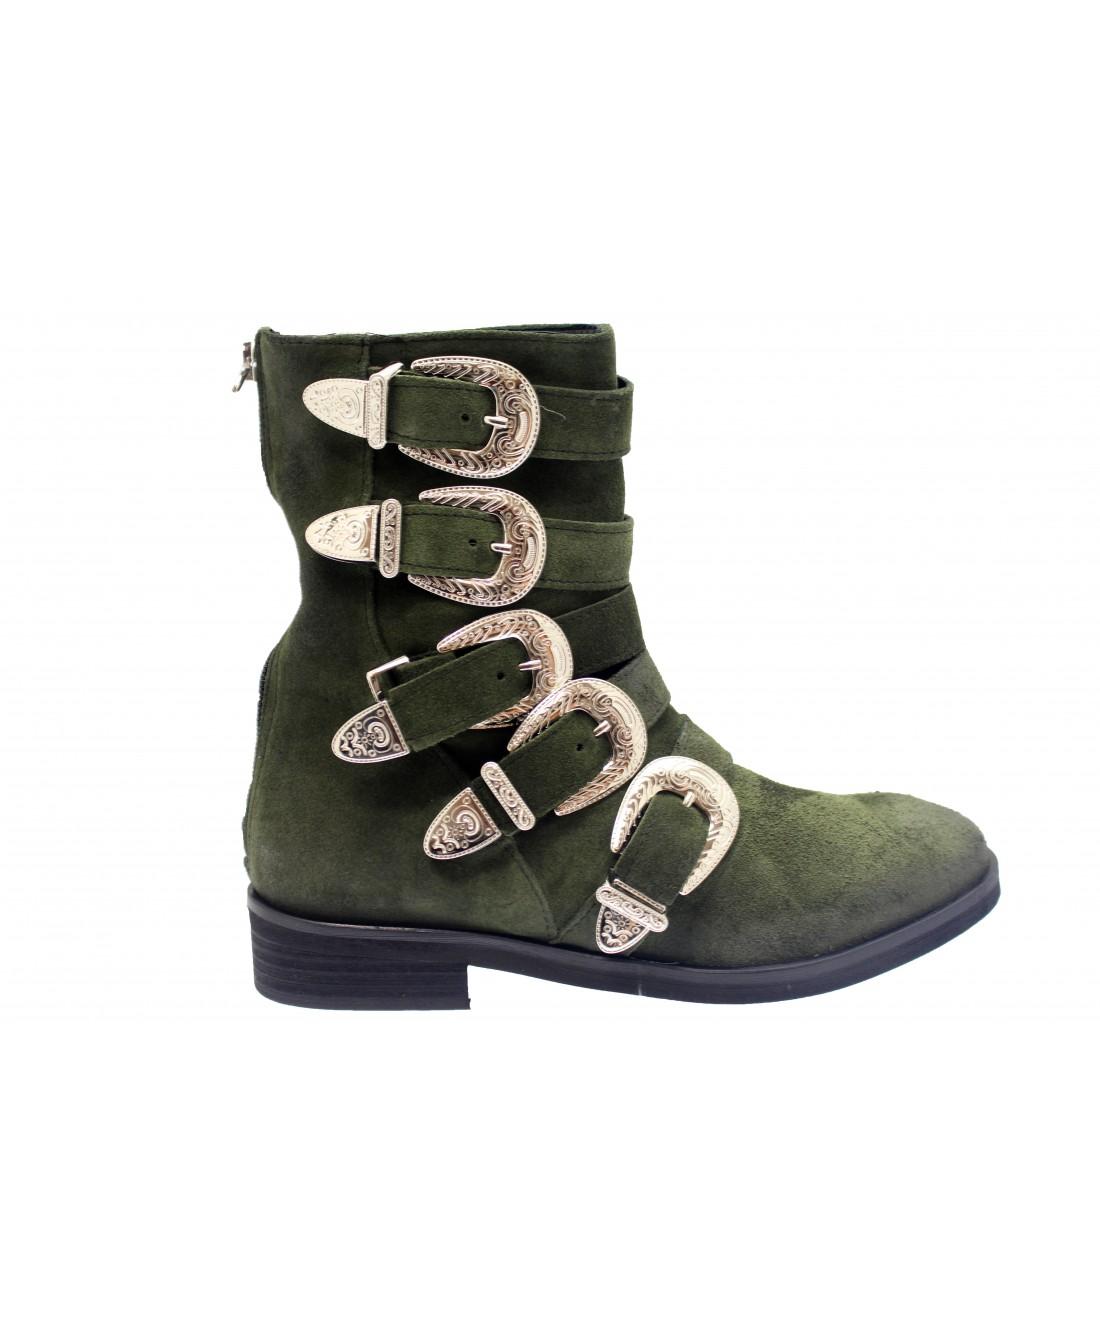 48ce1be7e29be Boots Hagar   Daim Kaki Multi Sangle   Boucle Métal Argenté. Loading zoom